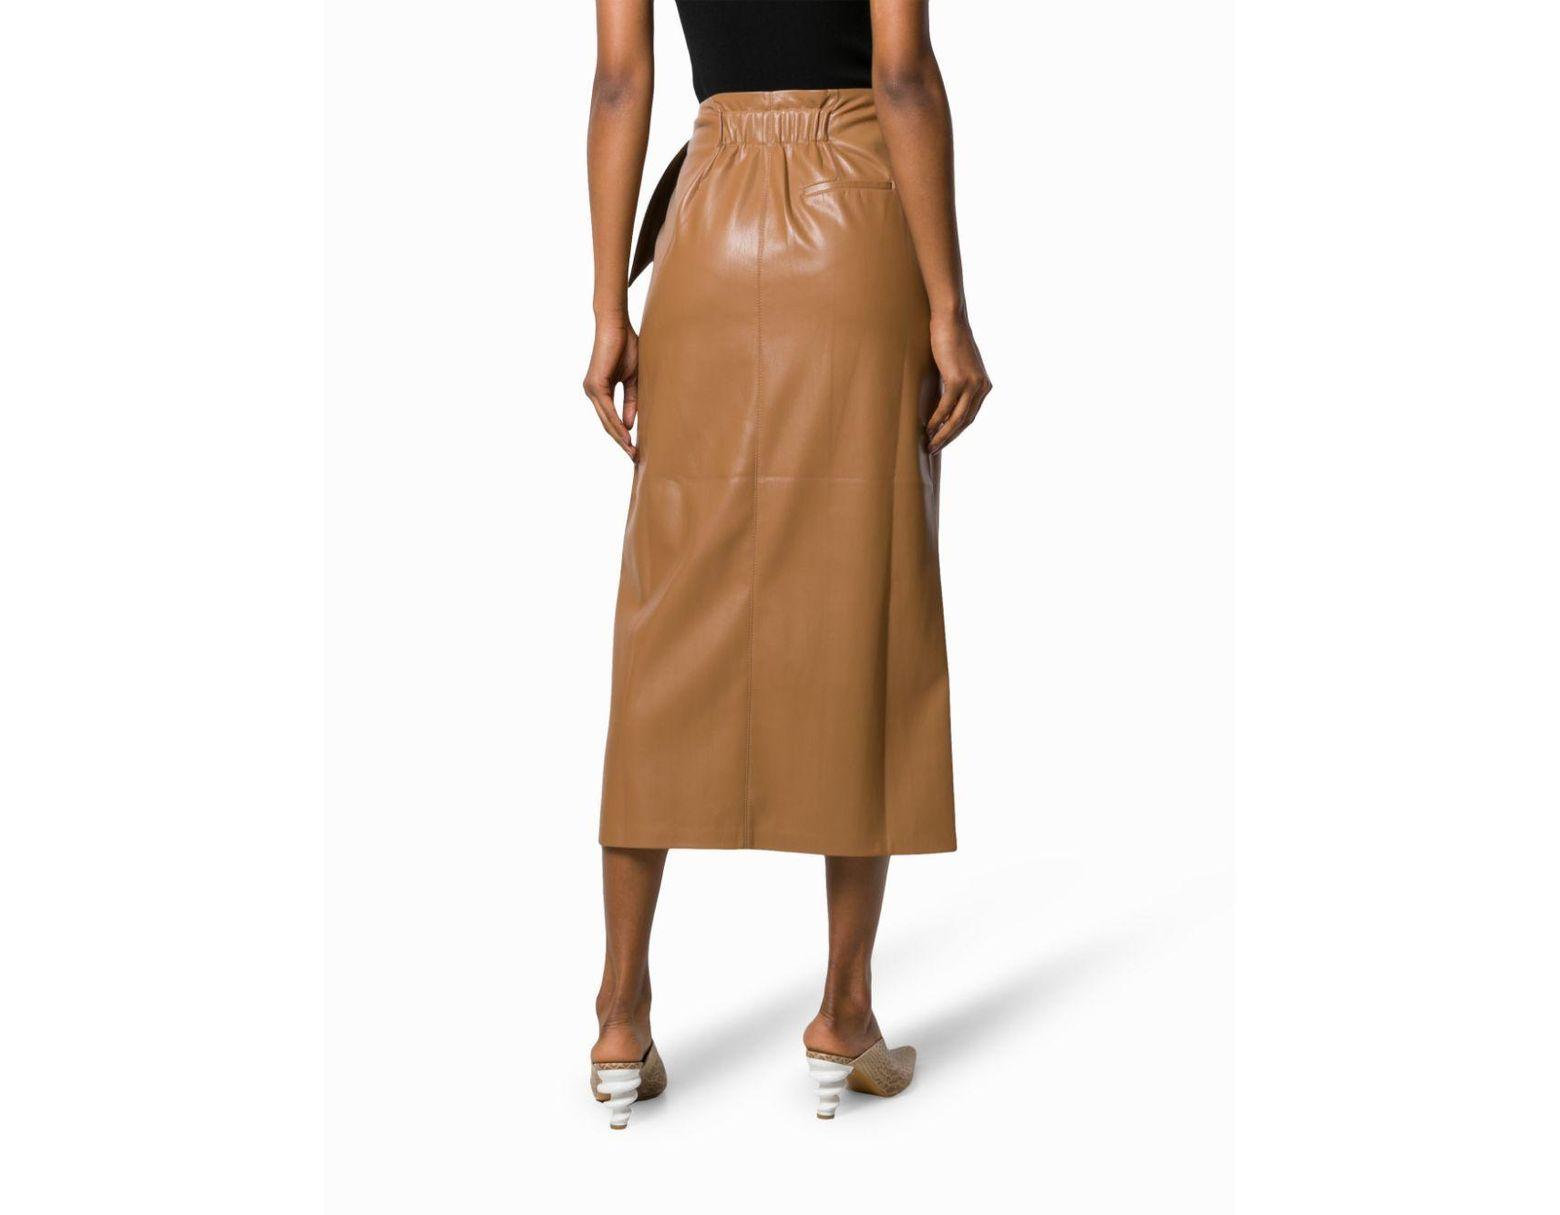 899e751e1a Nanushka Wrapped Midi Skirt in Brown - Save 12% - Lyst